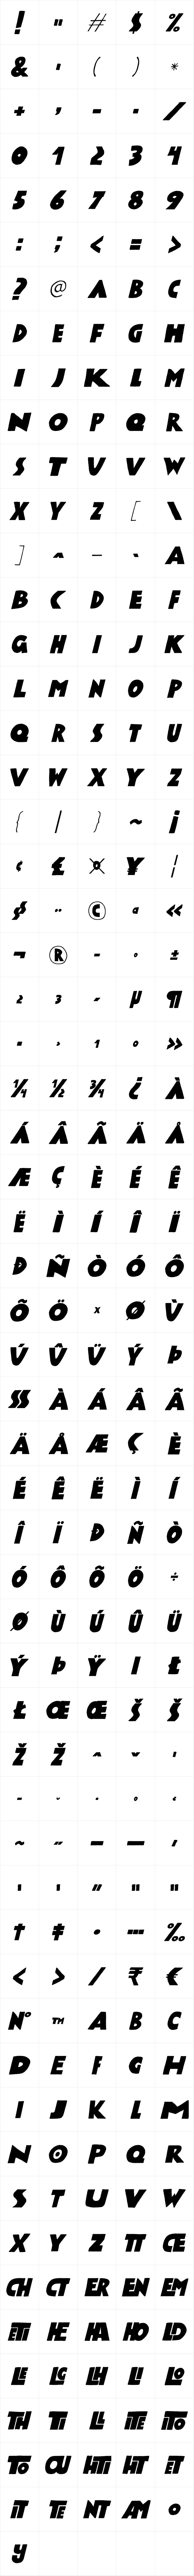 Kokoschka Oblique